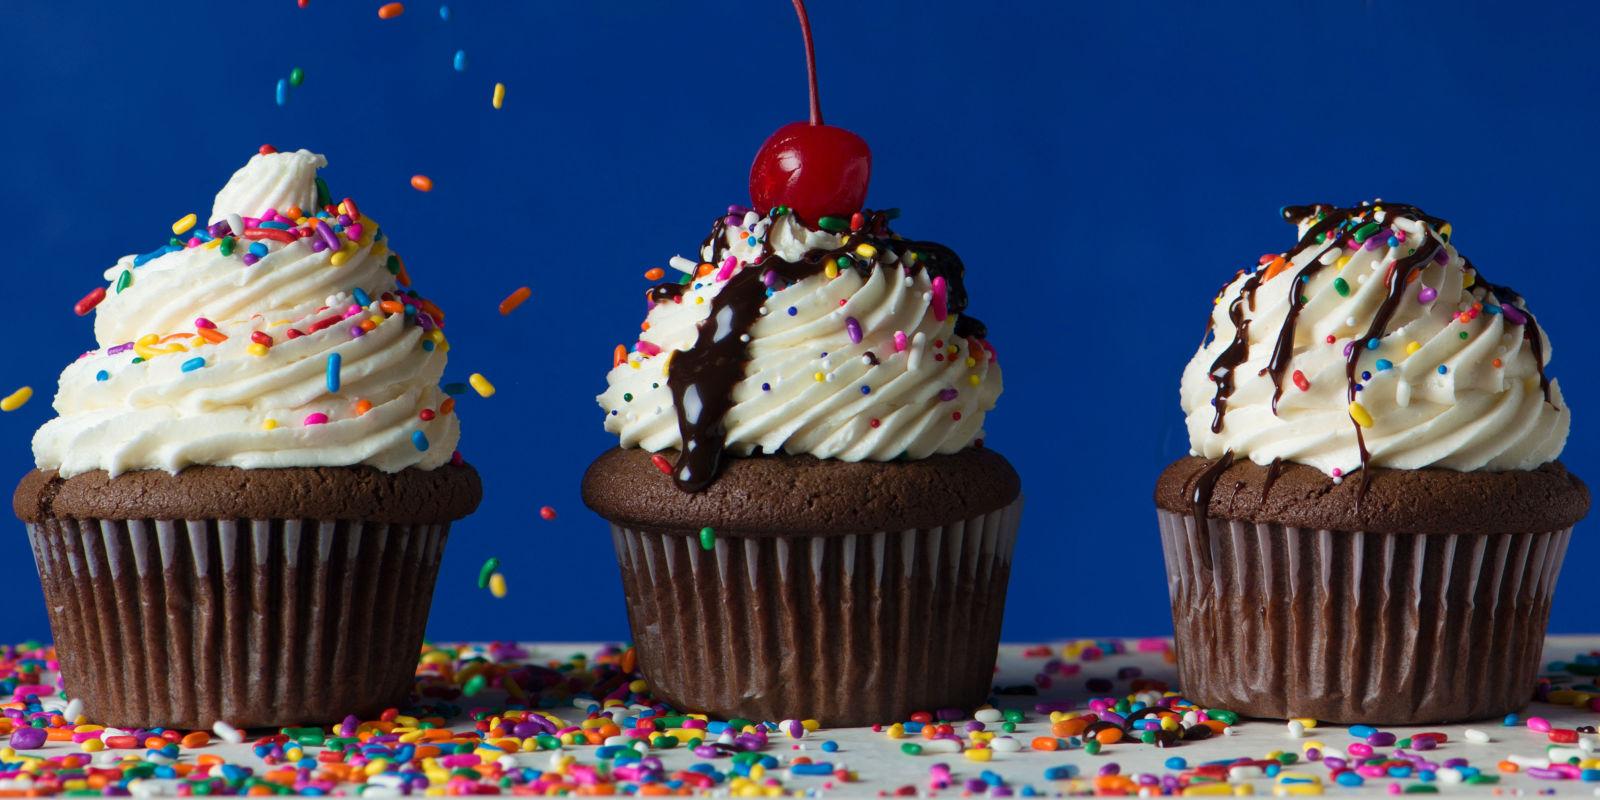 How To Make Chocolate Sundae Cupcakes  Best Chocolate Sundae Cupcake Recipe